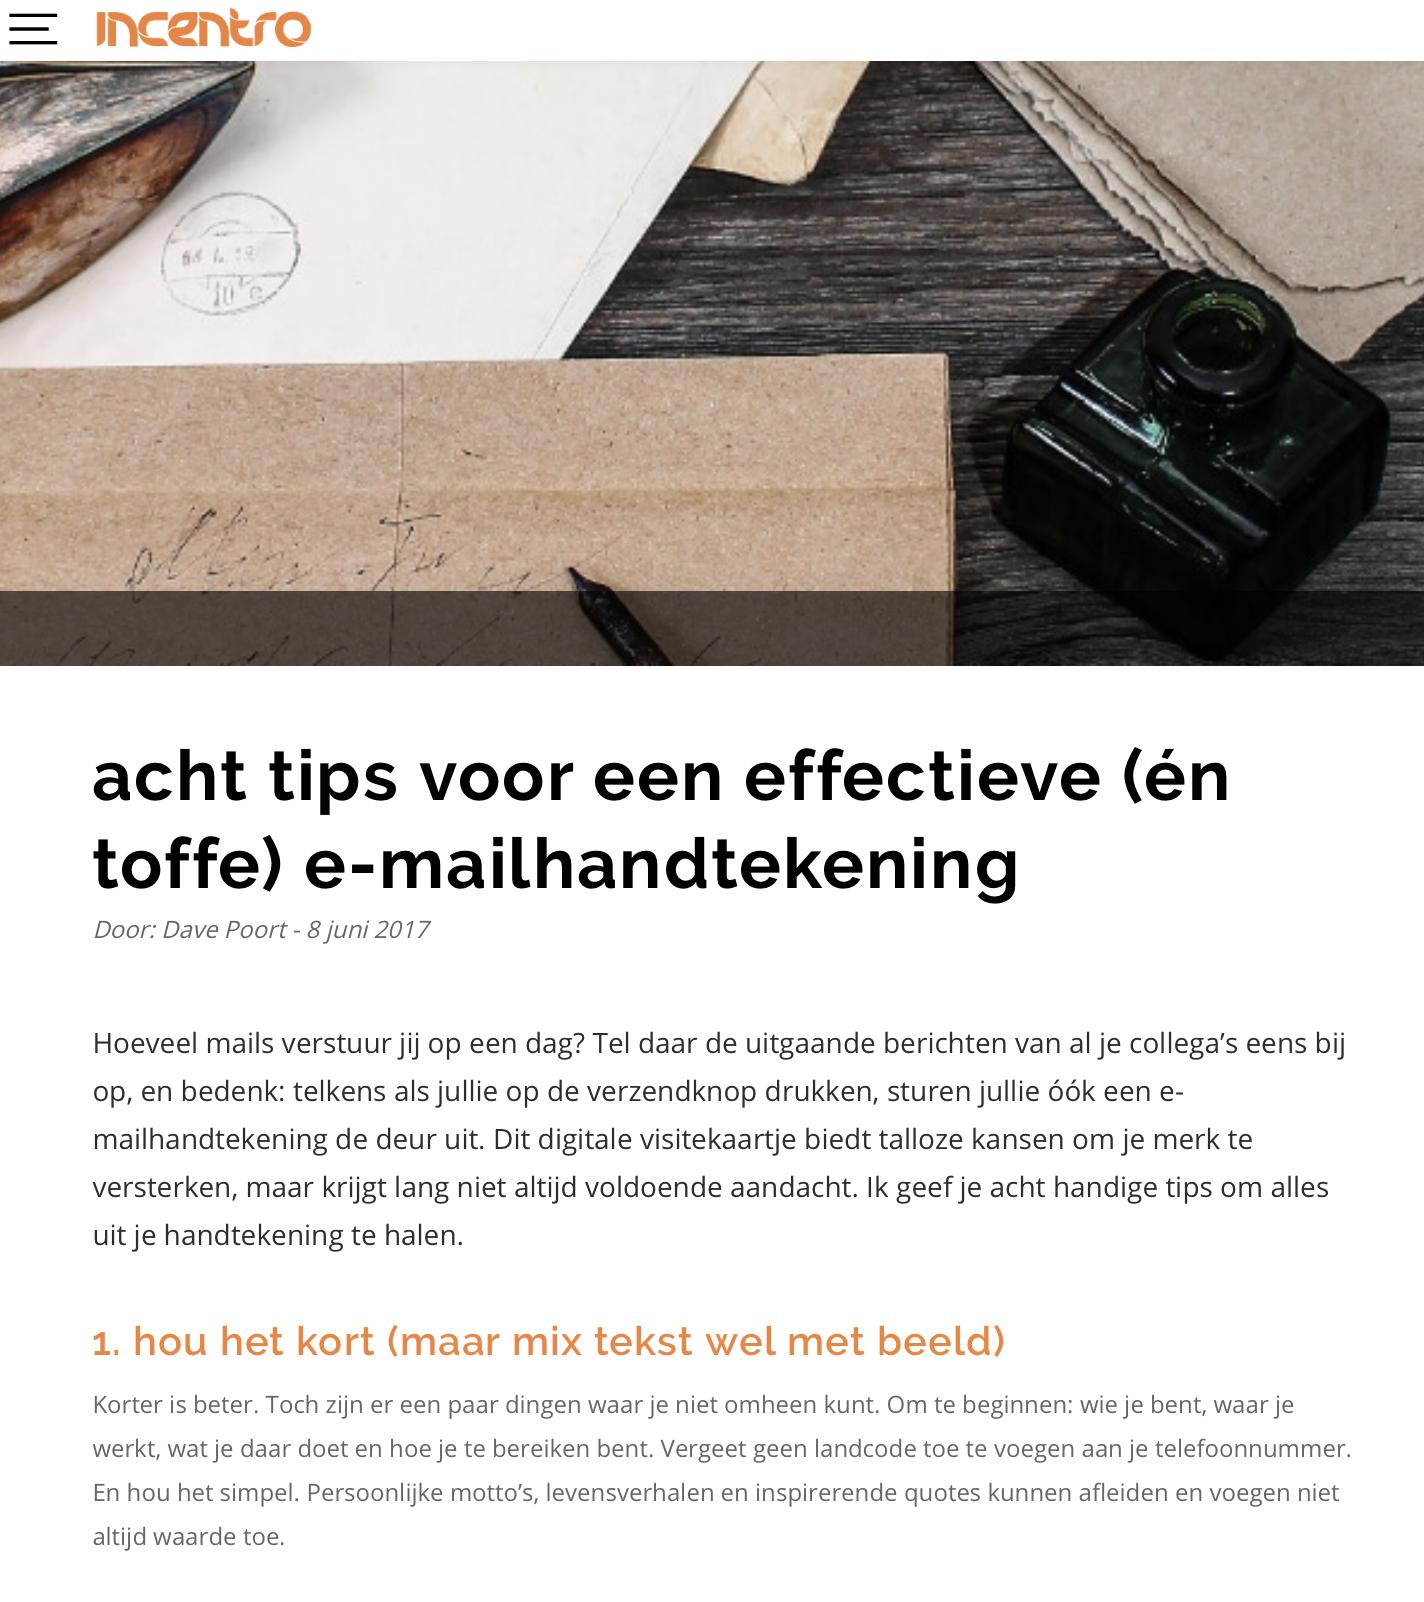 case-incentro-content-schrijven-tekstwerf.jpg#asset:251